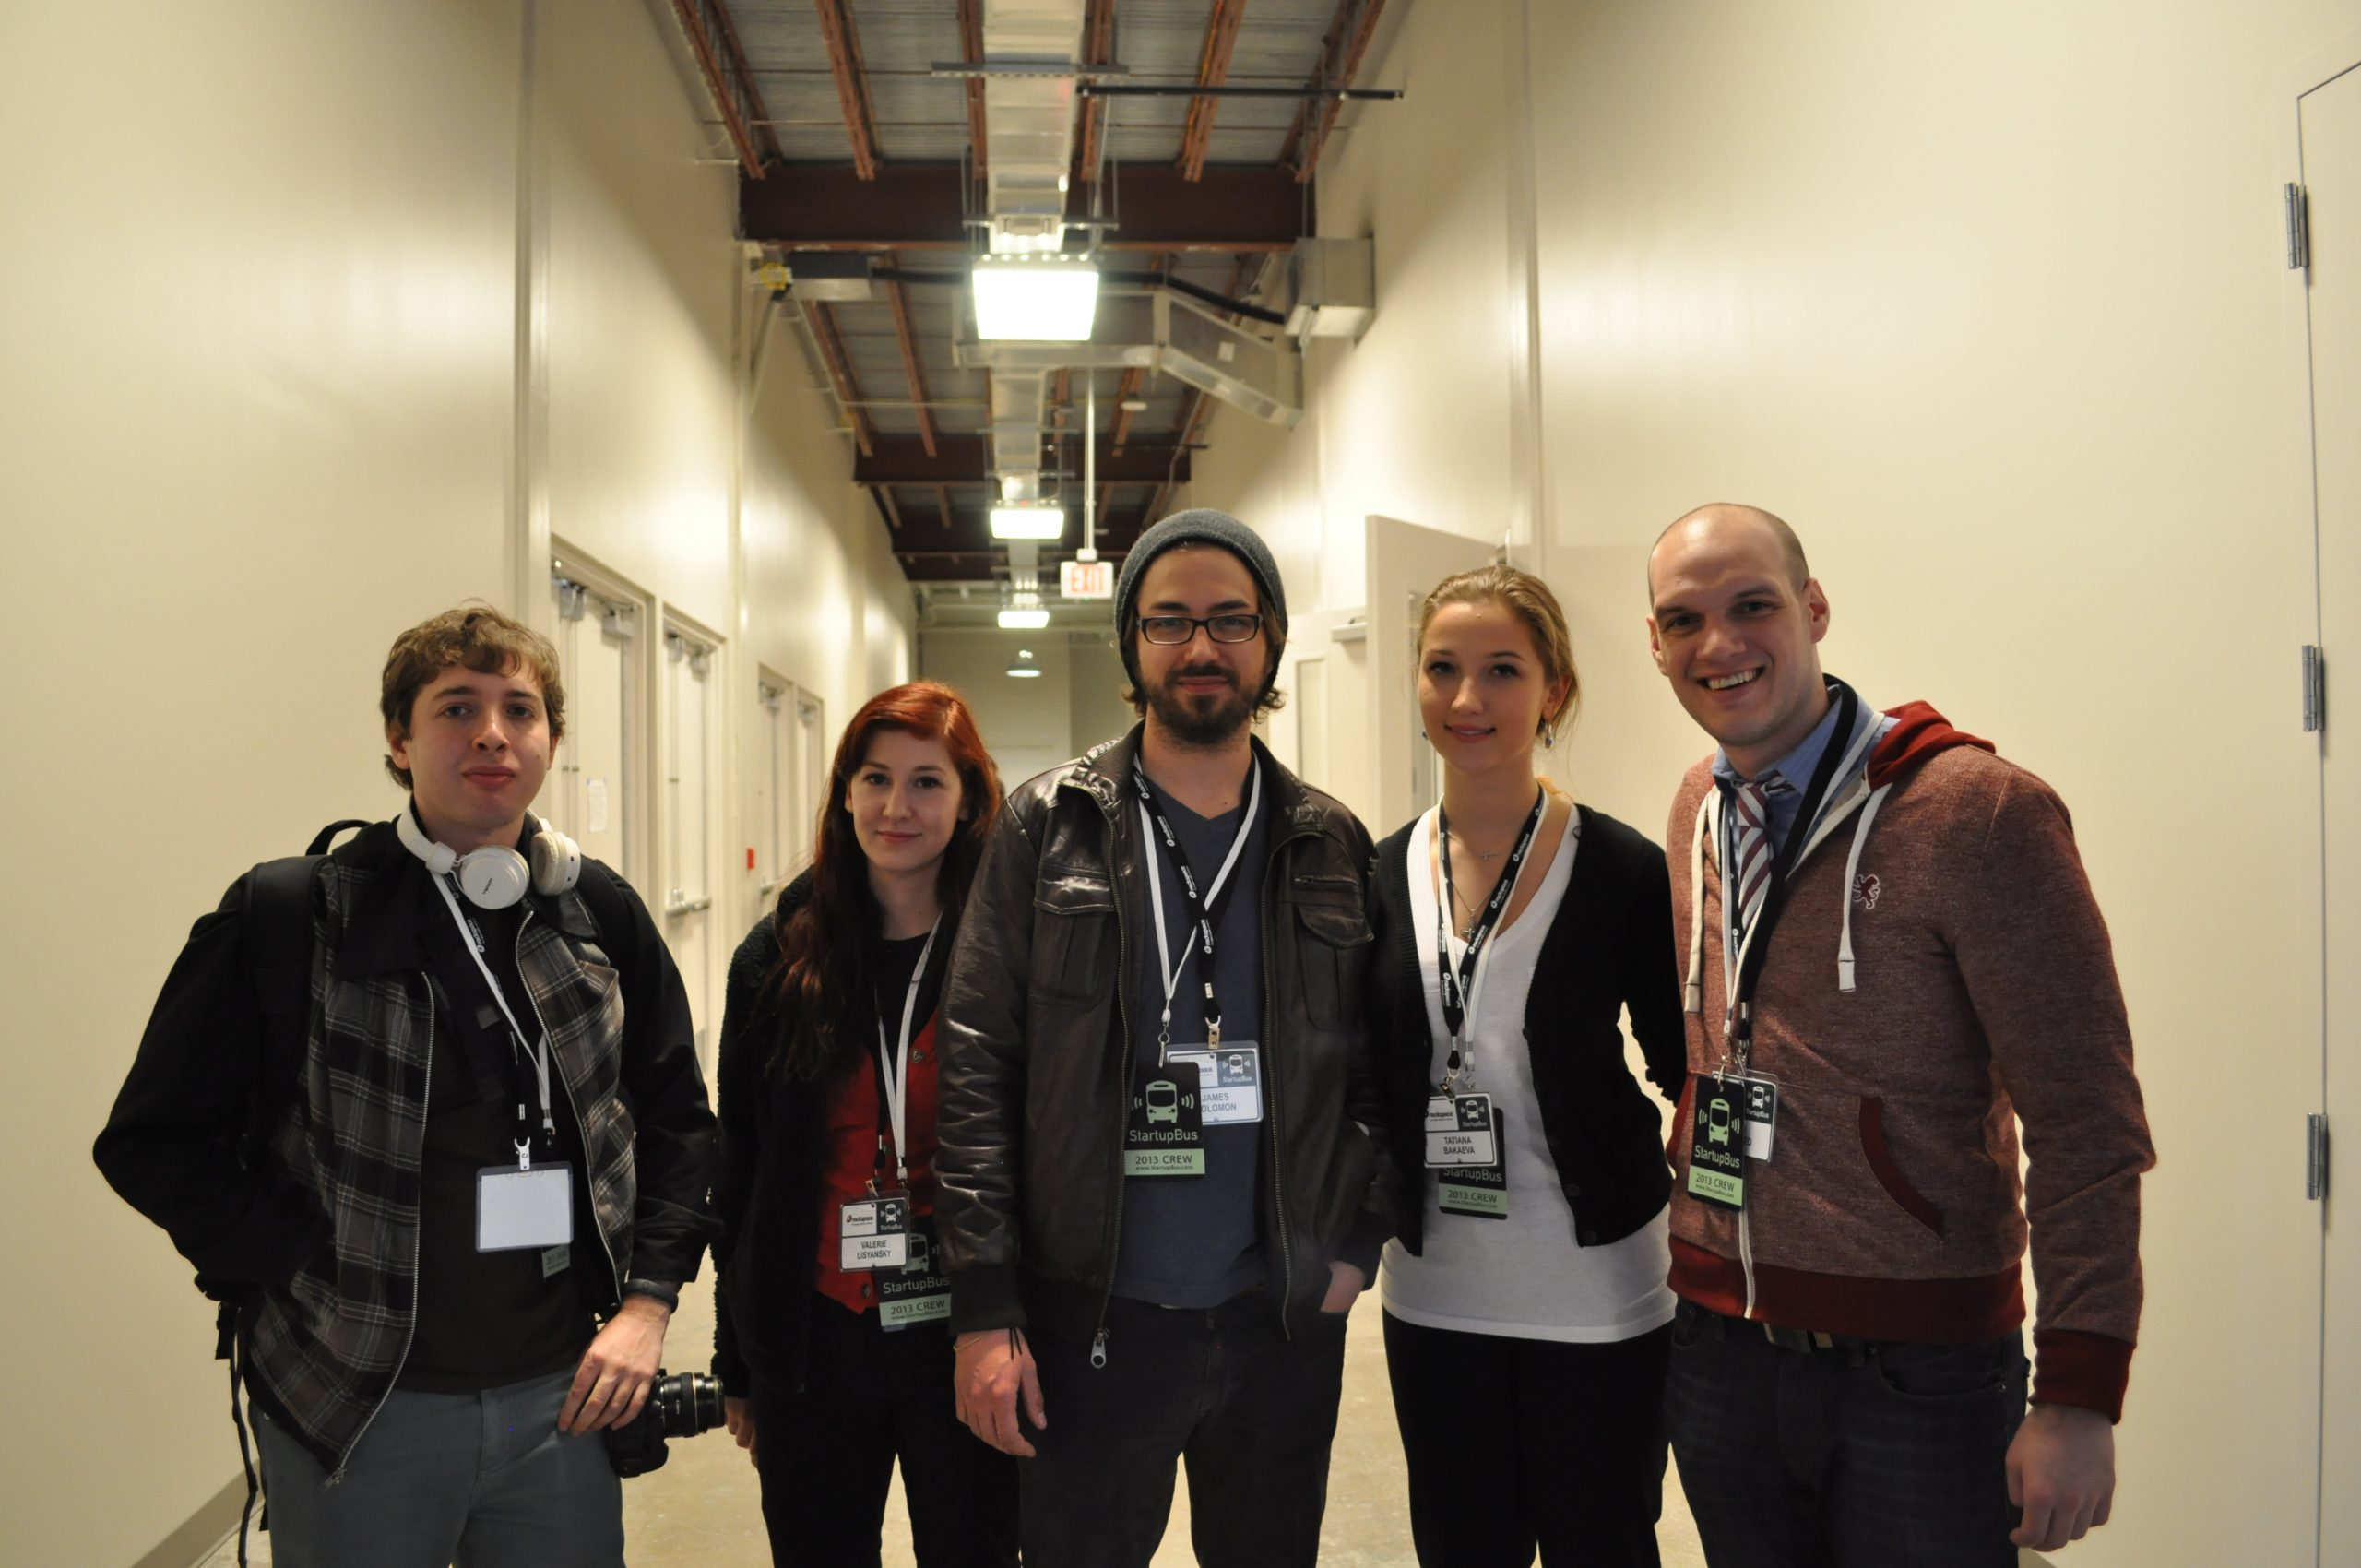 CareerMob, winner of the StartUpBus finals at Rackspace. From left: Matthew Bergami, Valerie Lisyansky, James Solomon, Tatiana Alexsadrovna and Josh Seefried.